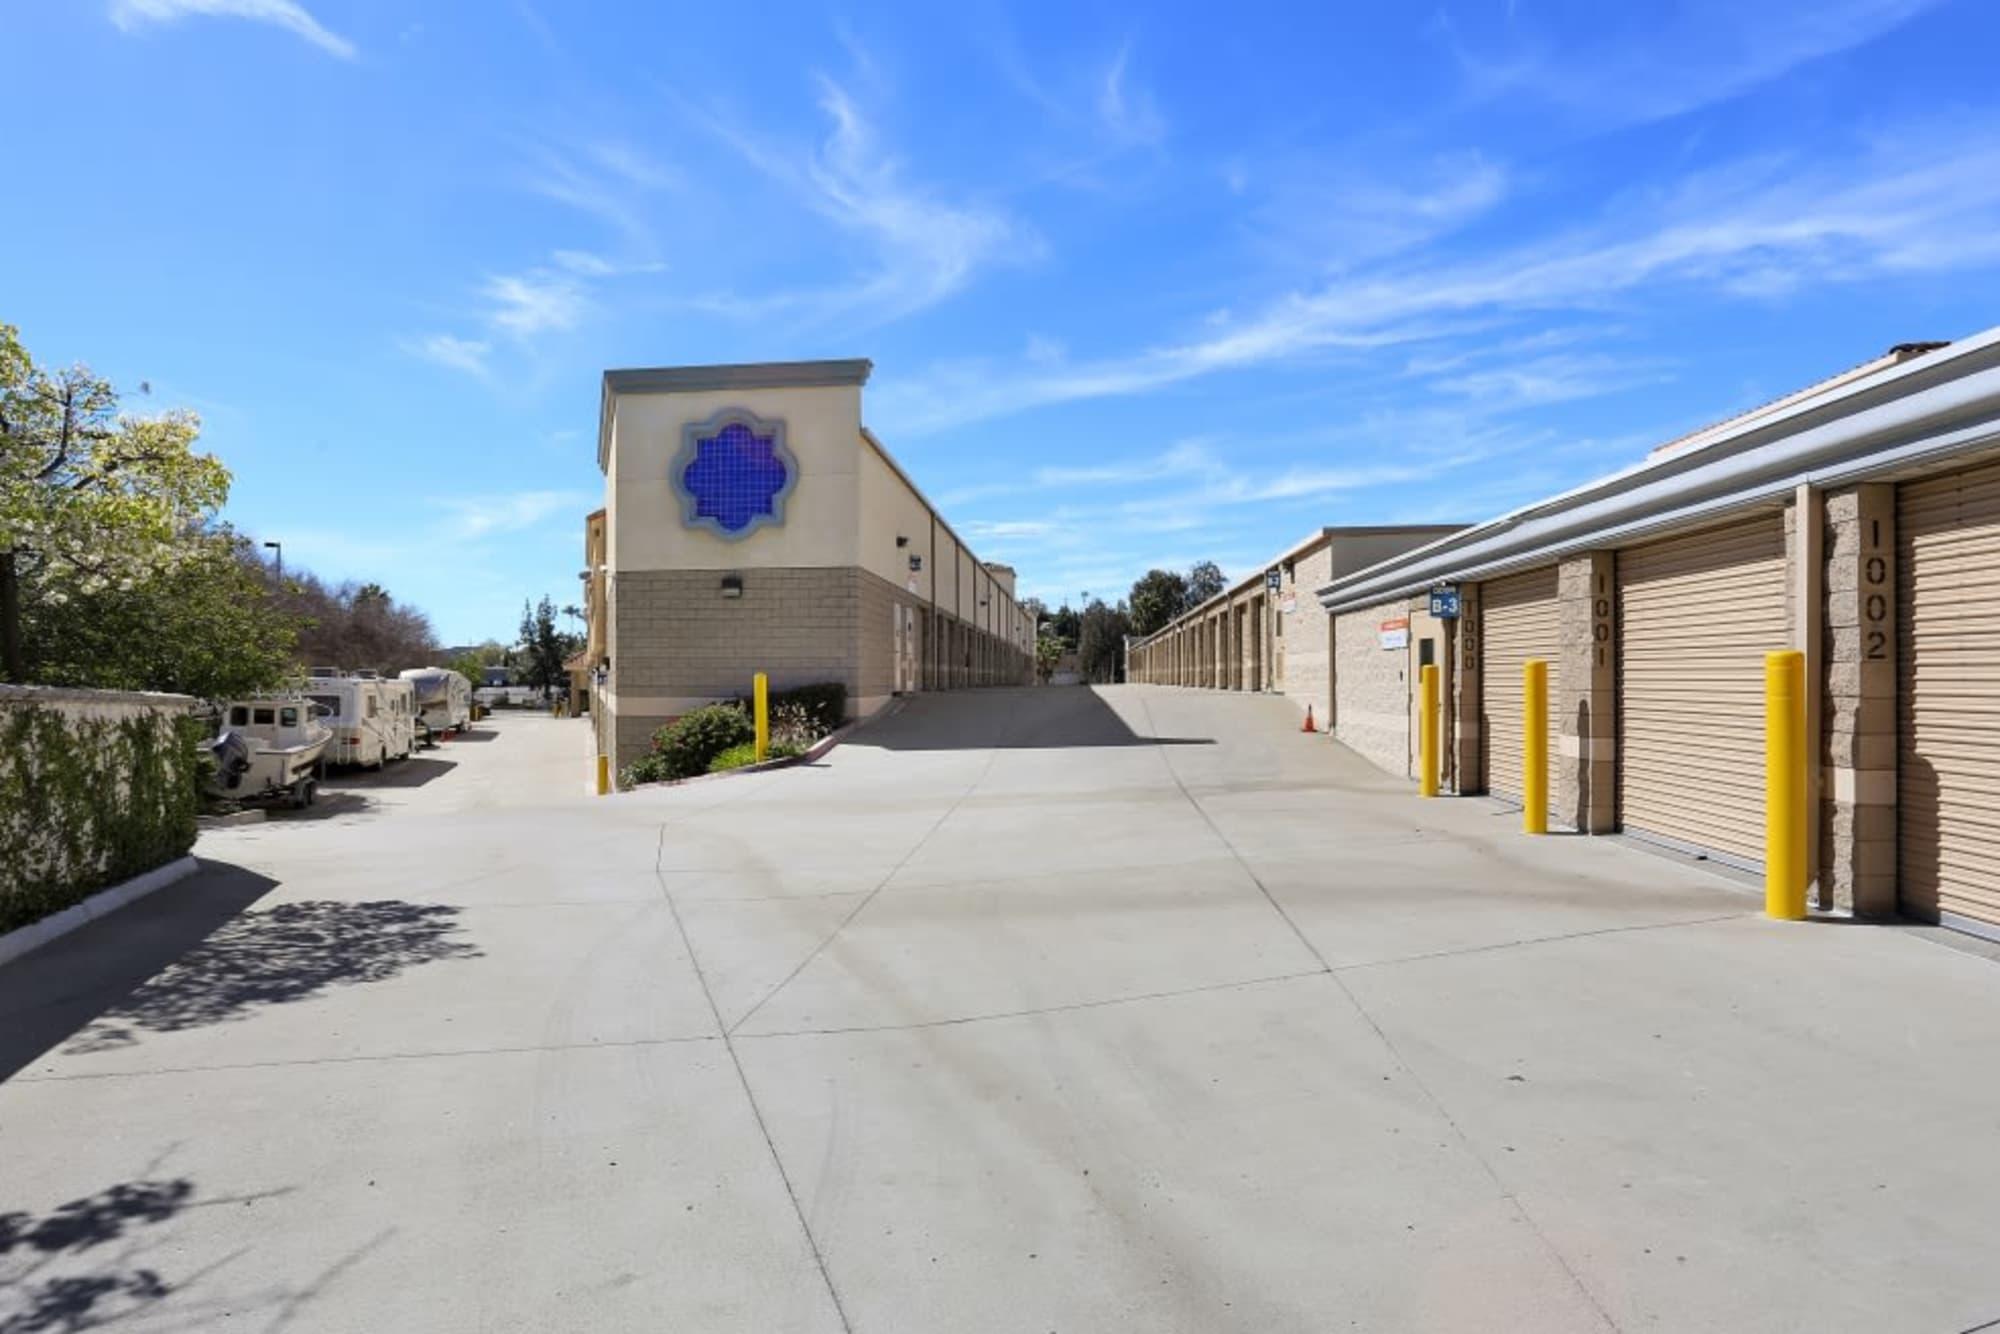 Drive-up storage units at A-1 Self Storage in La Mesa, California